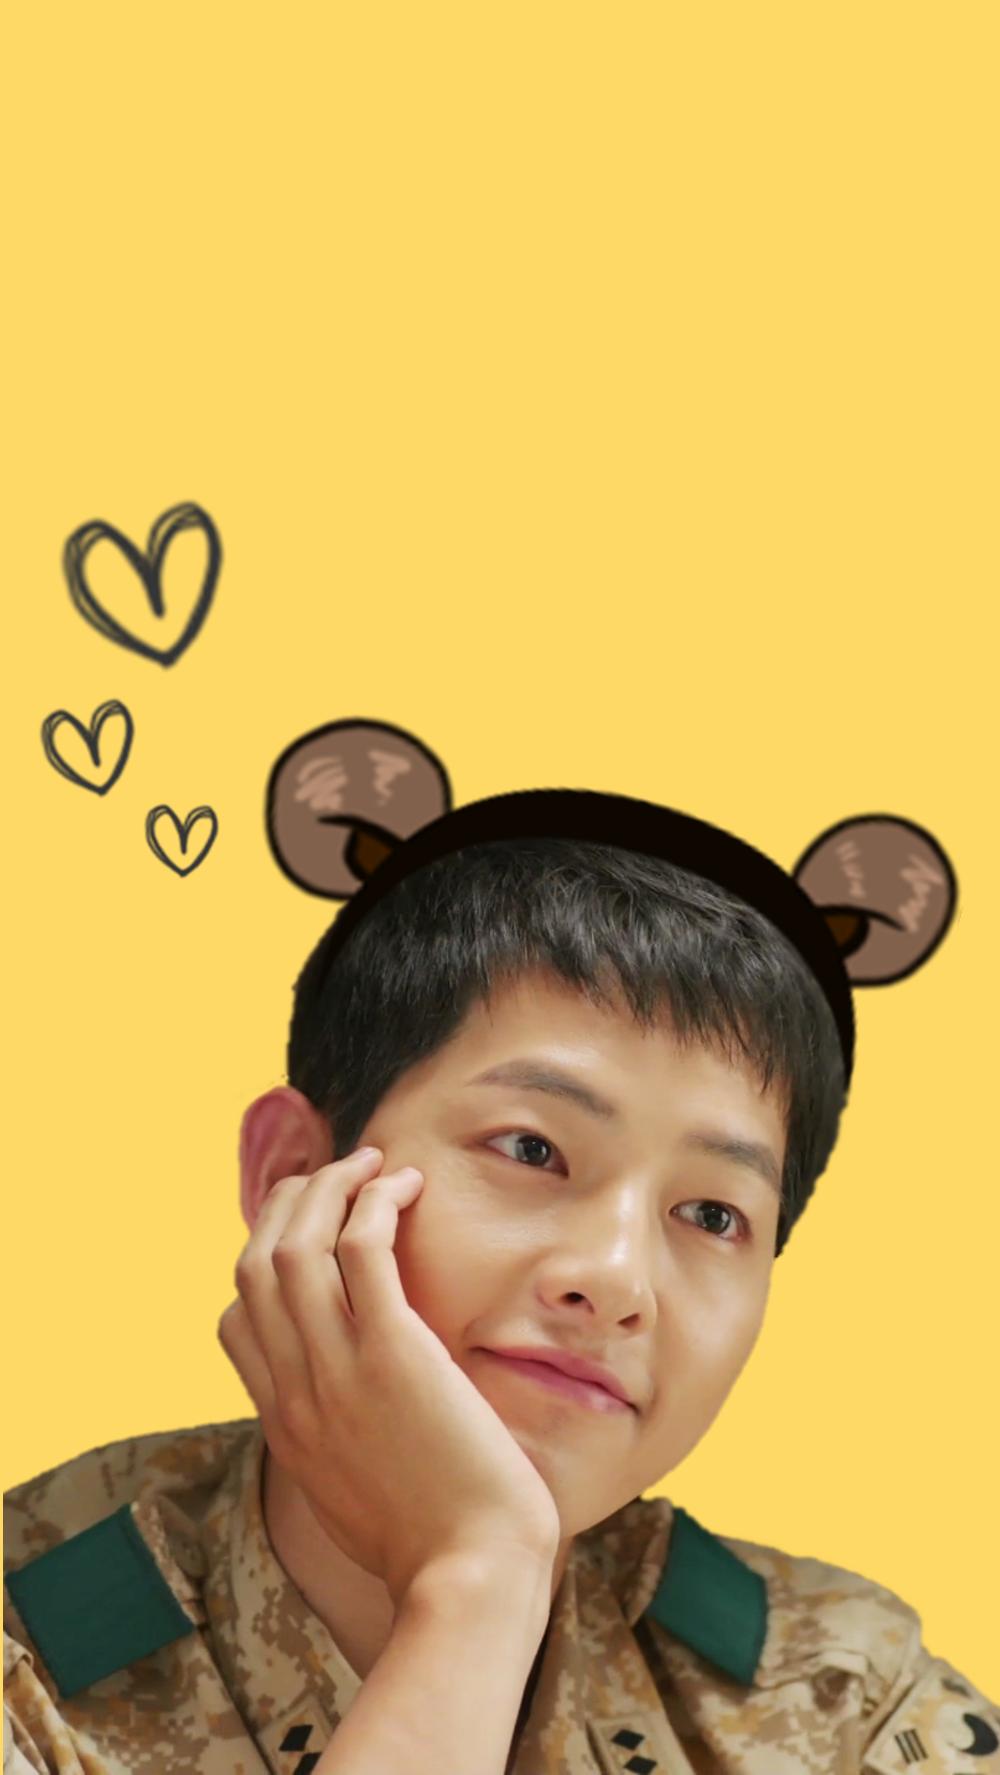 Jin iphone wallpaper tumblr -  Wallpaper Descendant Of The Sun Tumblr